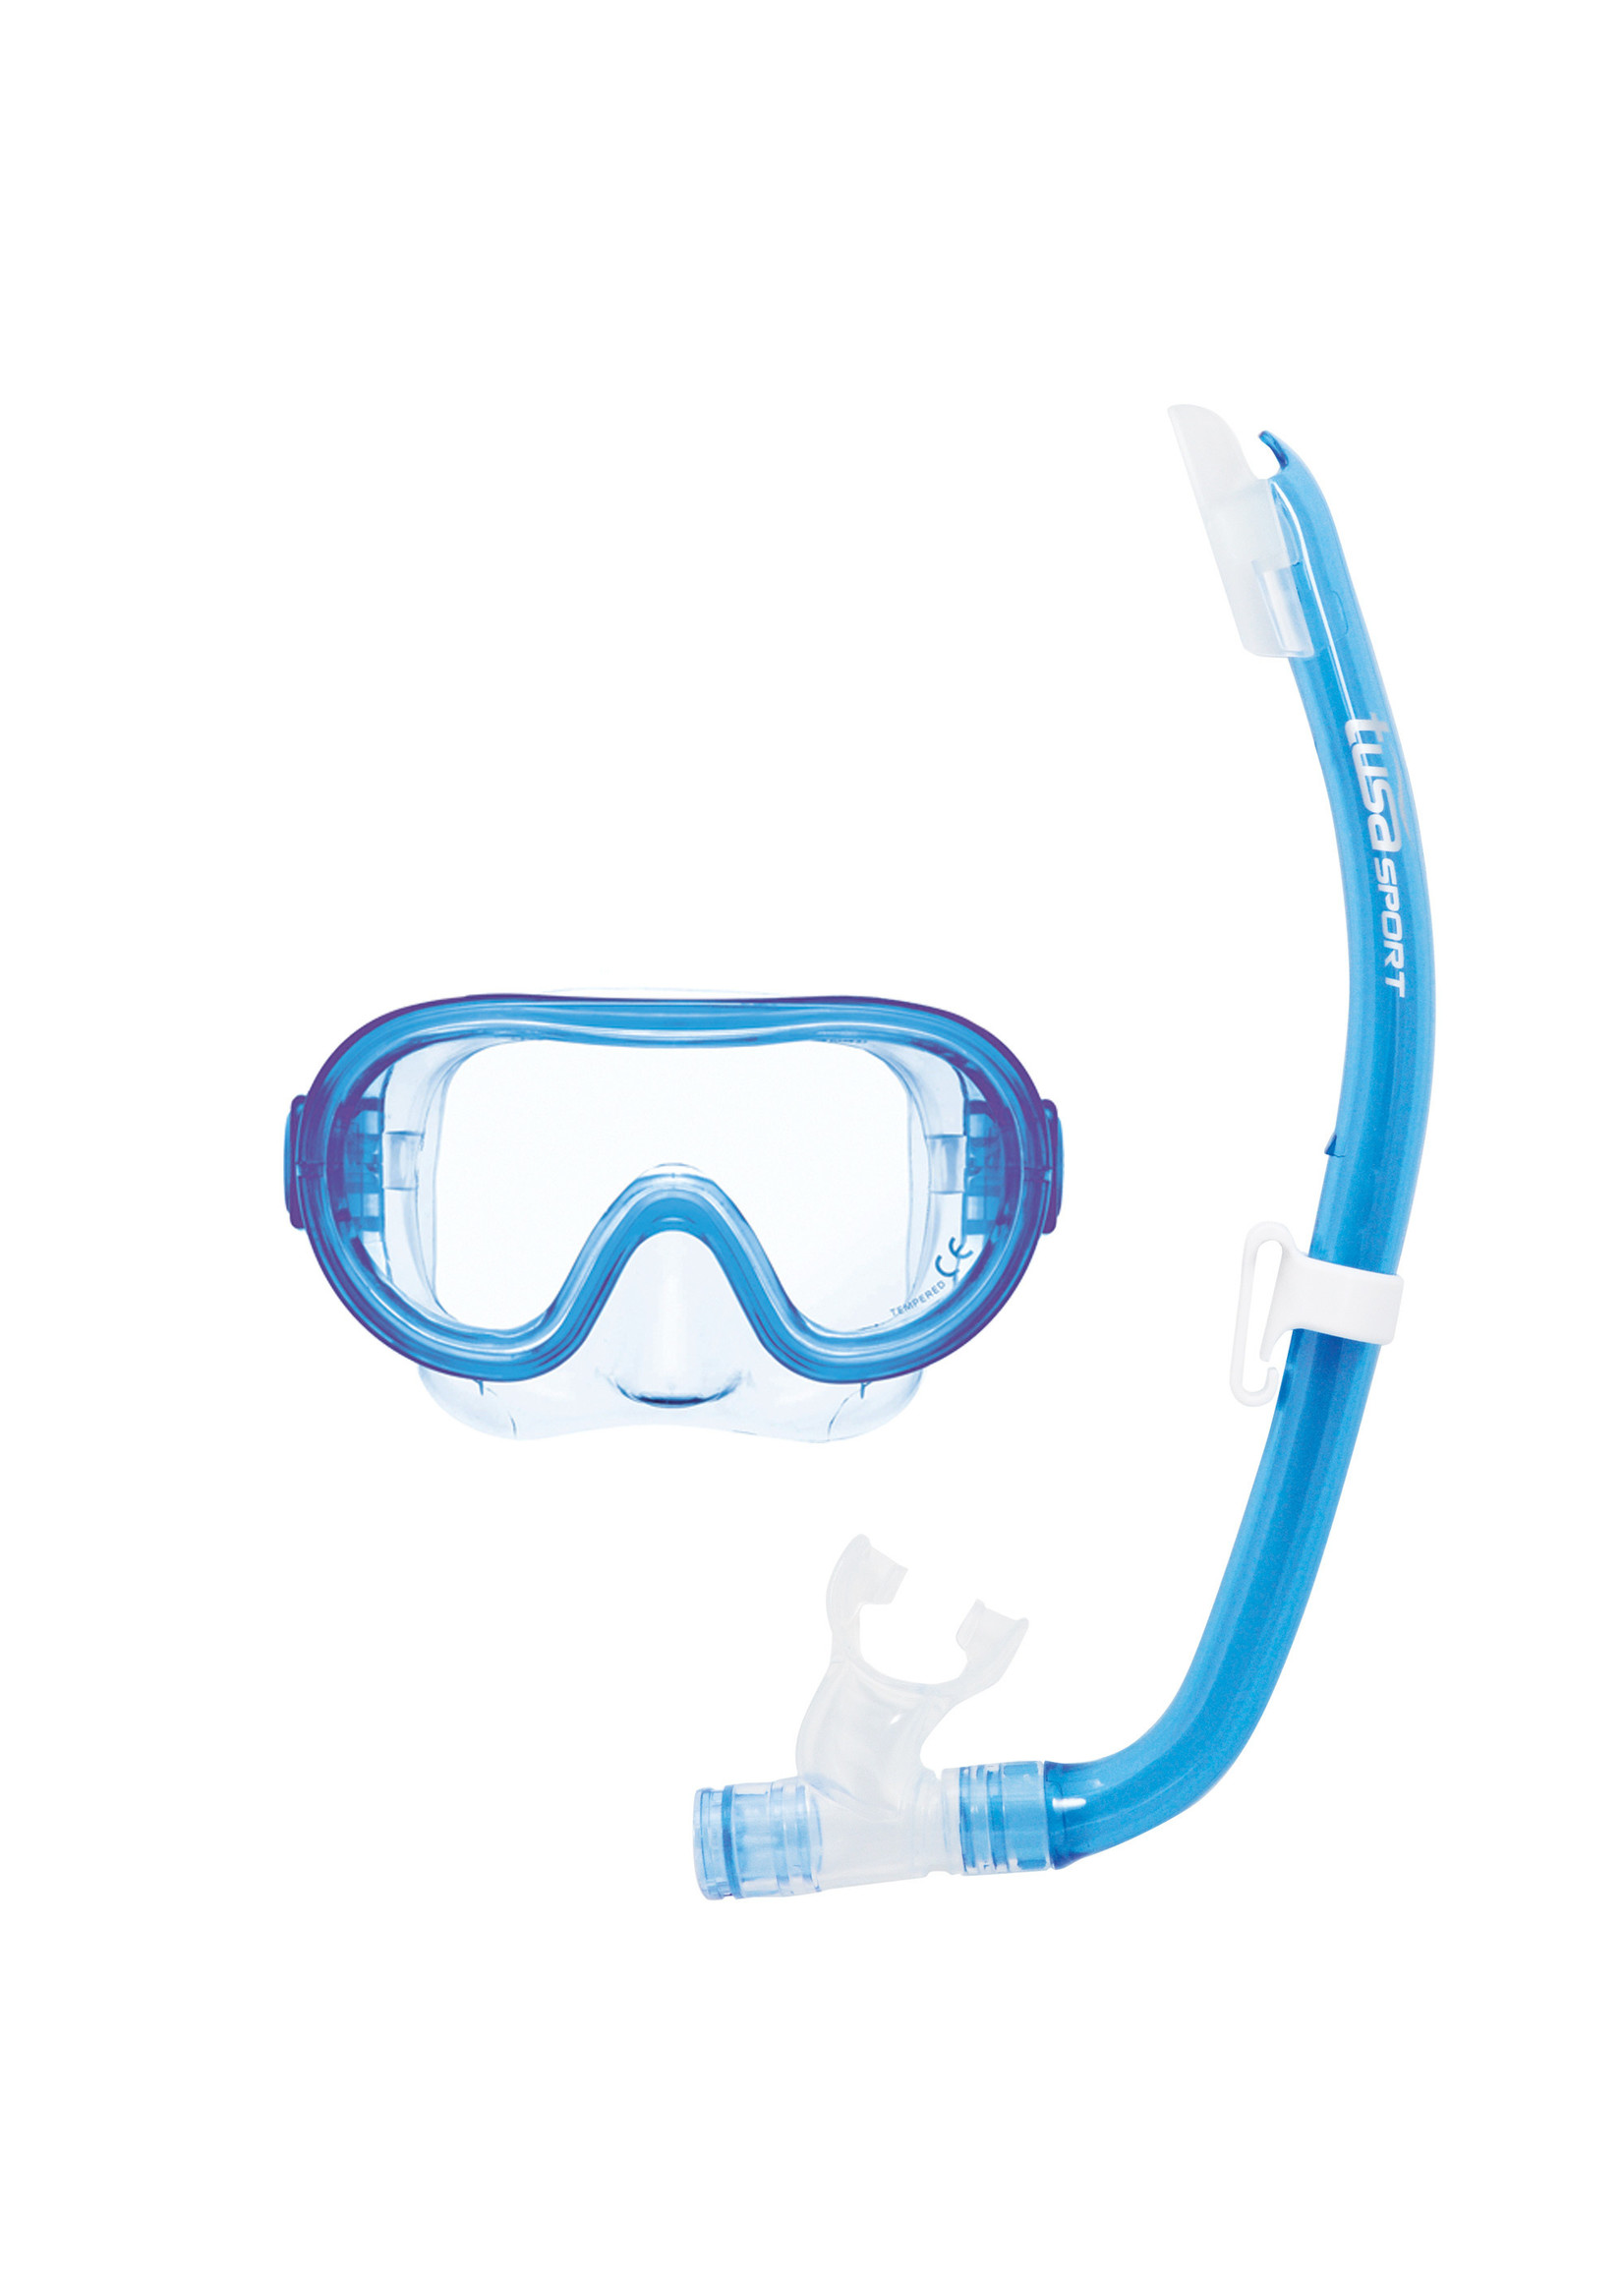 TUSA TUSA Mini Platina Youth Combo - Clear Light Blue